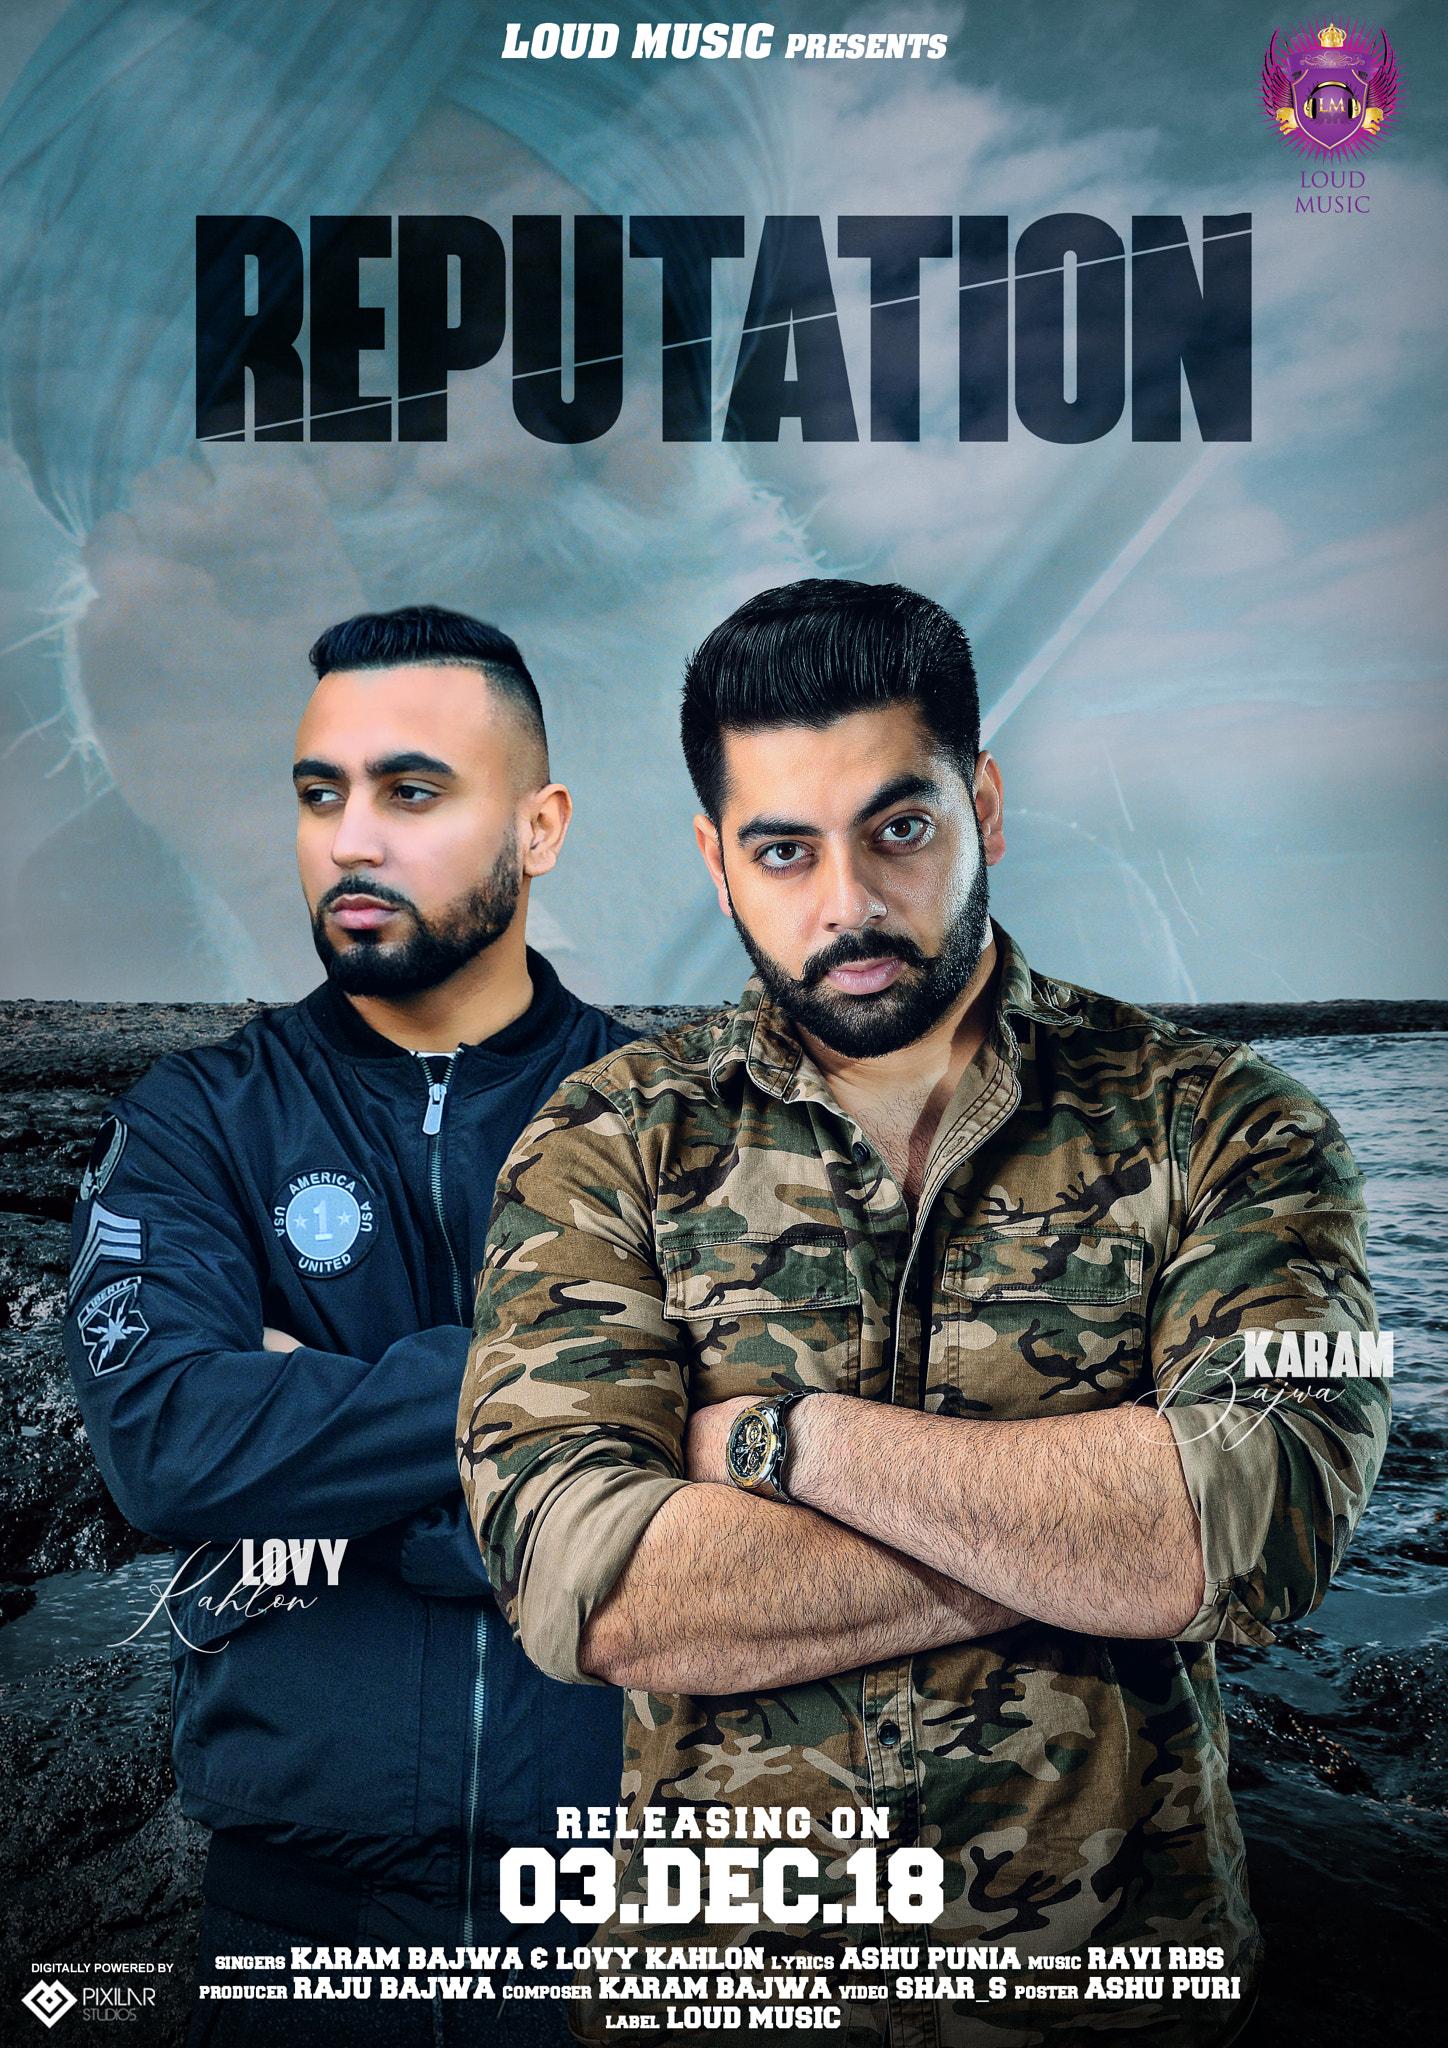 Reputation Poster